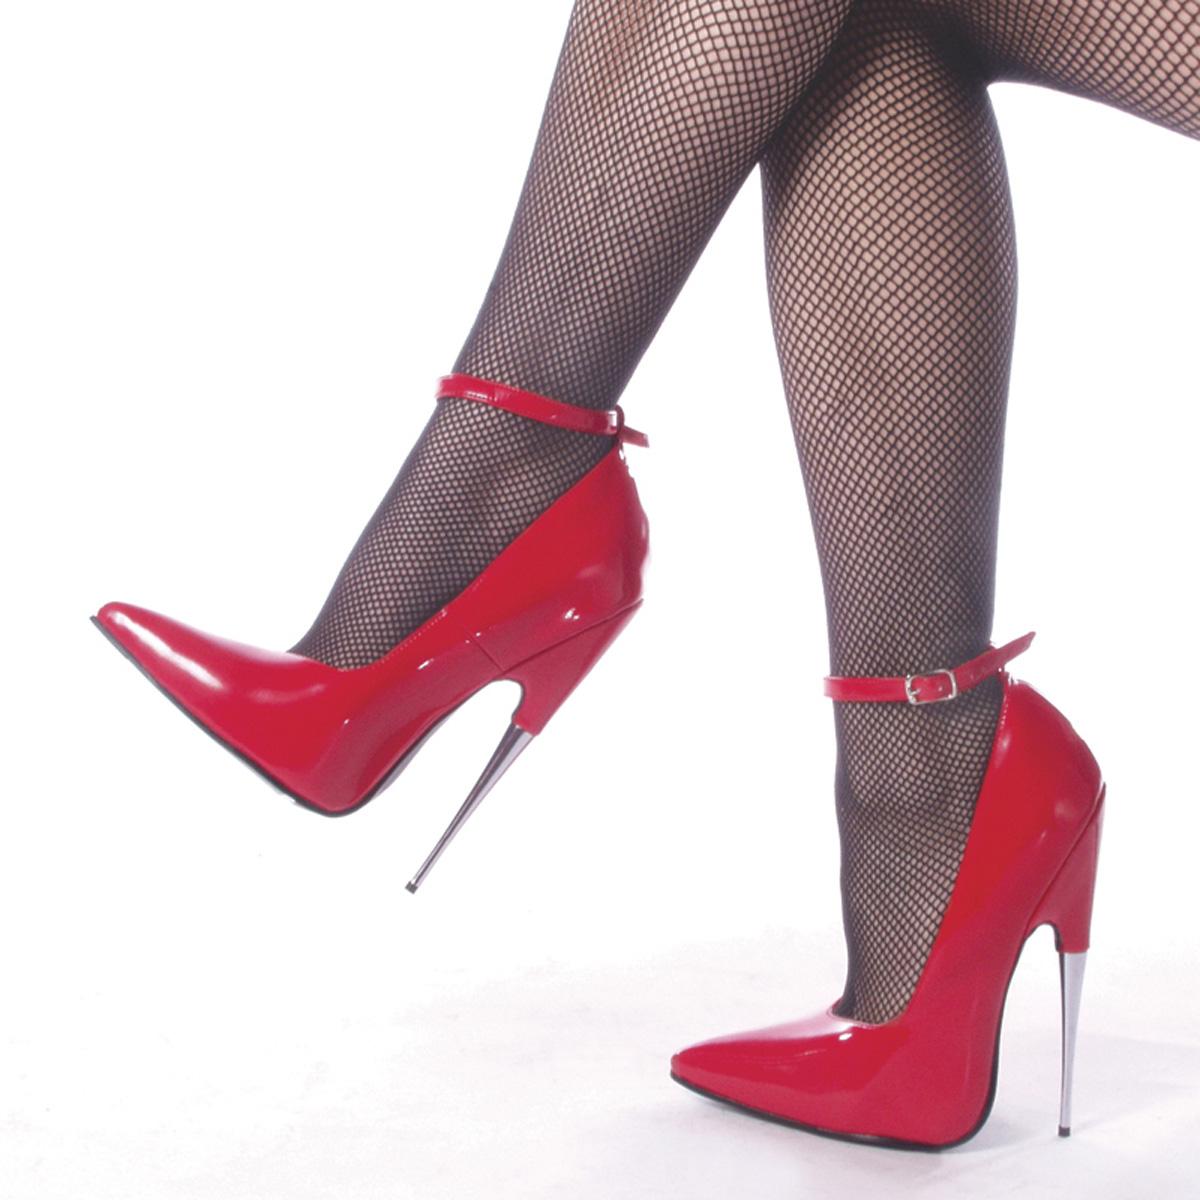 Karinluna New Wholesale Sexy Fetish High Heels Elegant Peep Toe Platform Summer Pumps Woman Shoes Womenwomen's Pumps